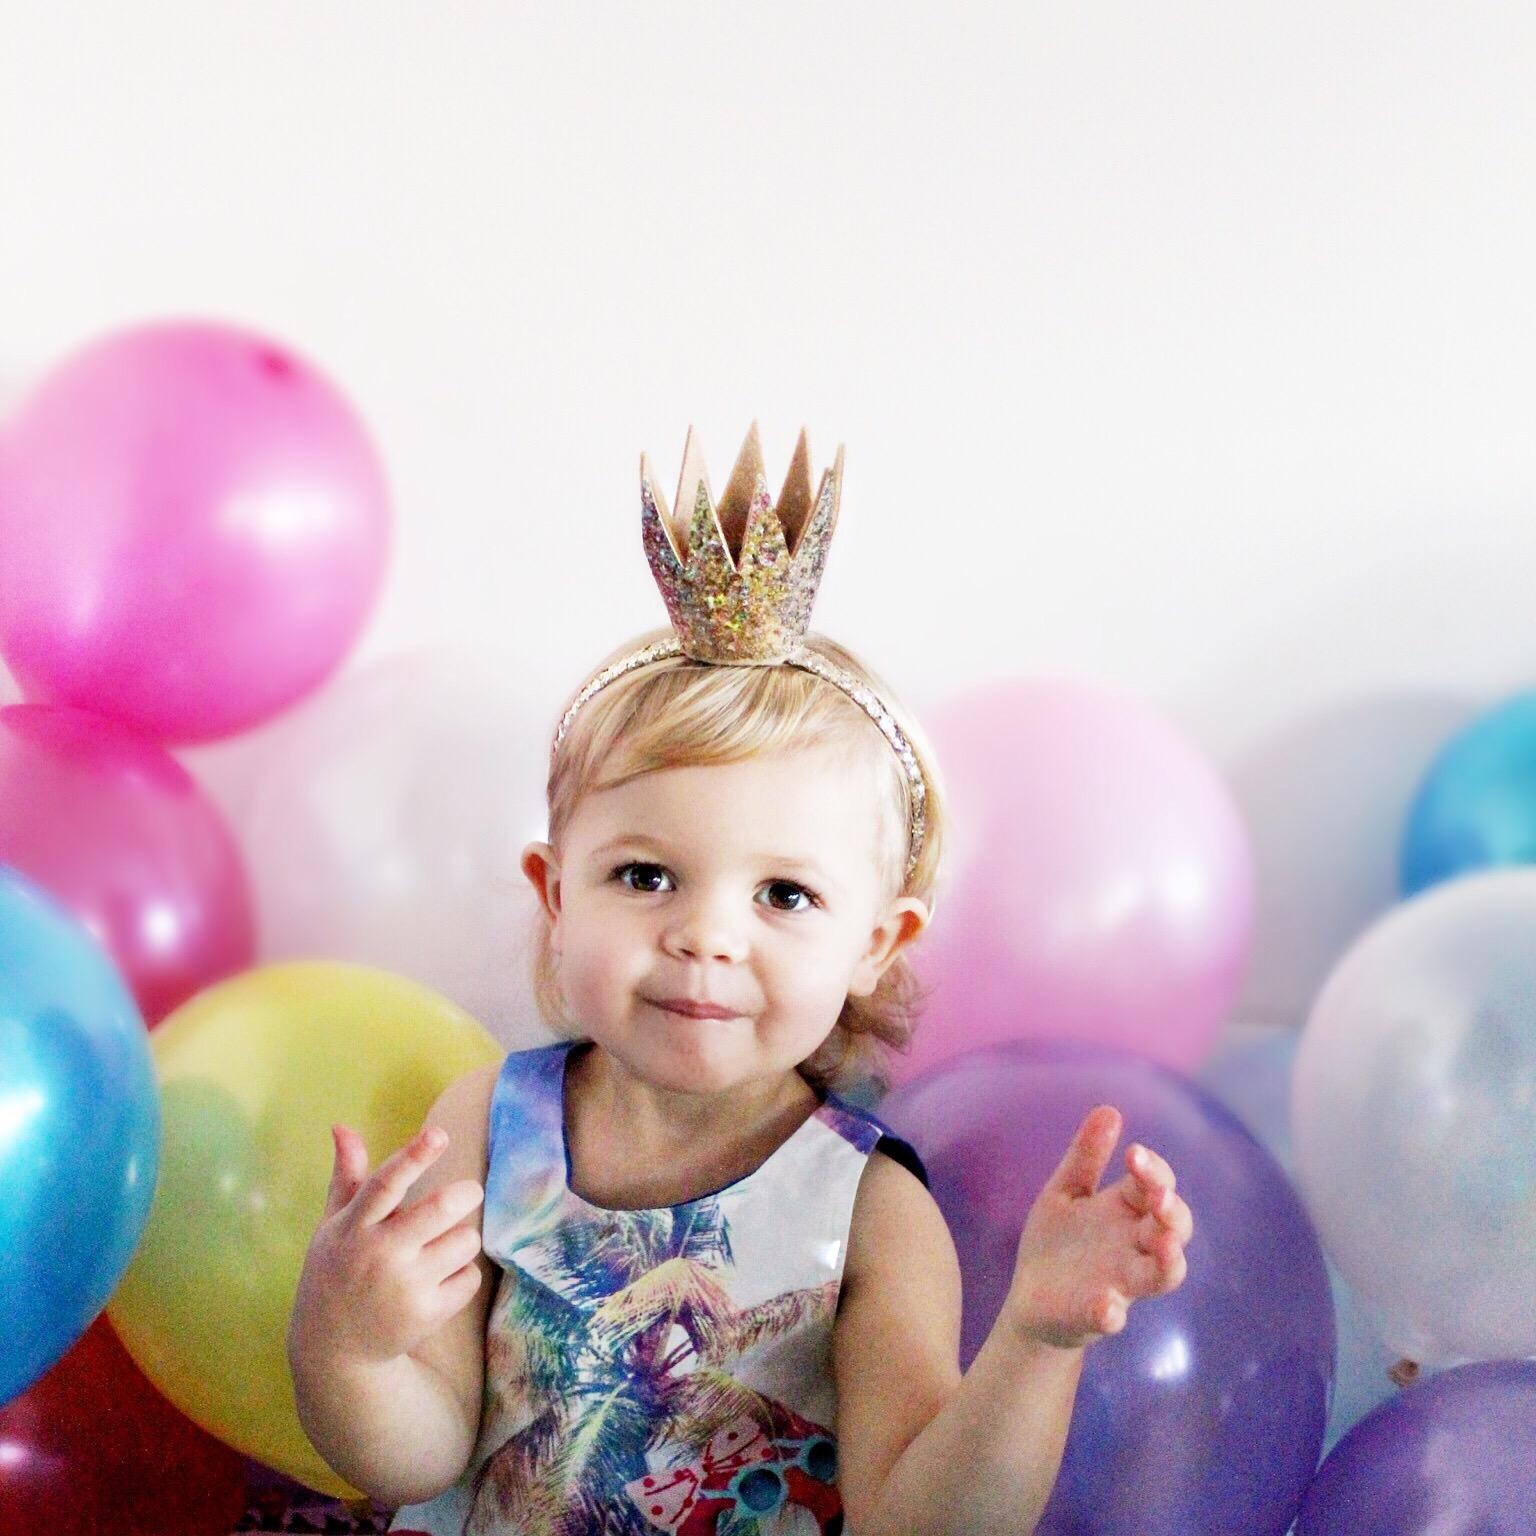 HAPPY 2nd BIRTHDAY, LUELLA!